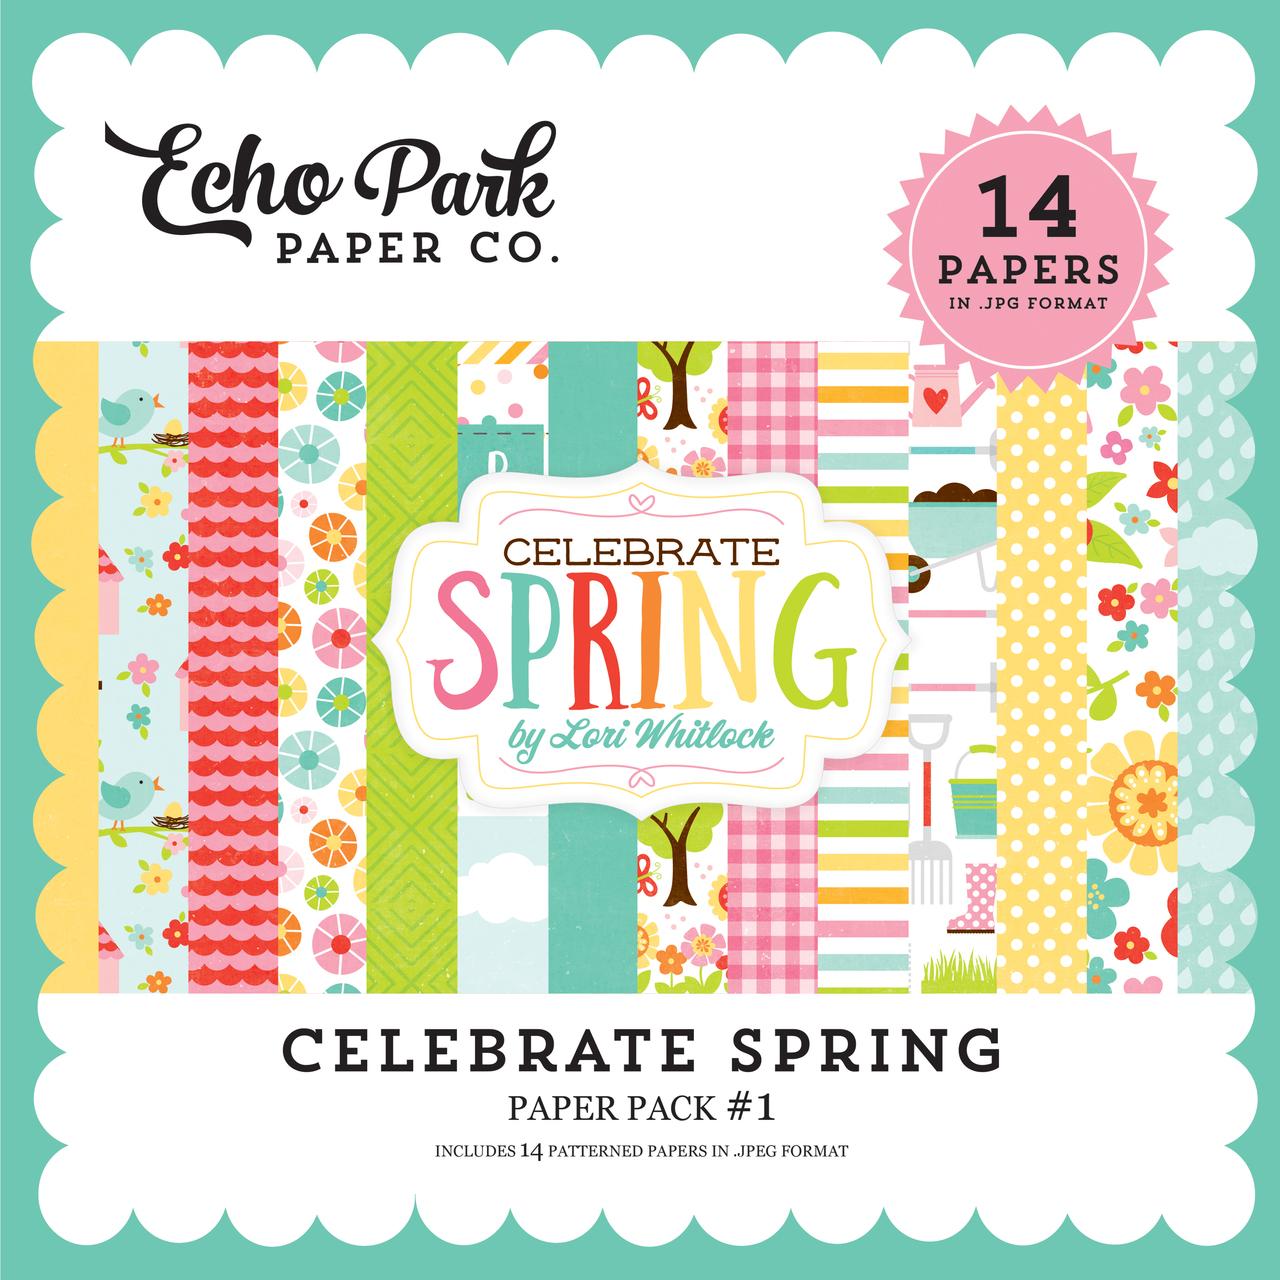 Celebrate Spring Paper Pack